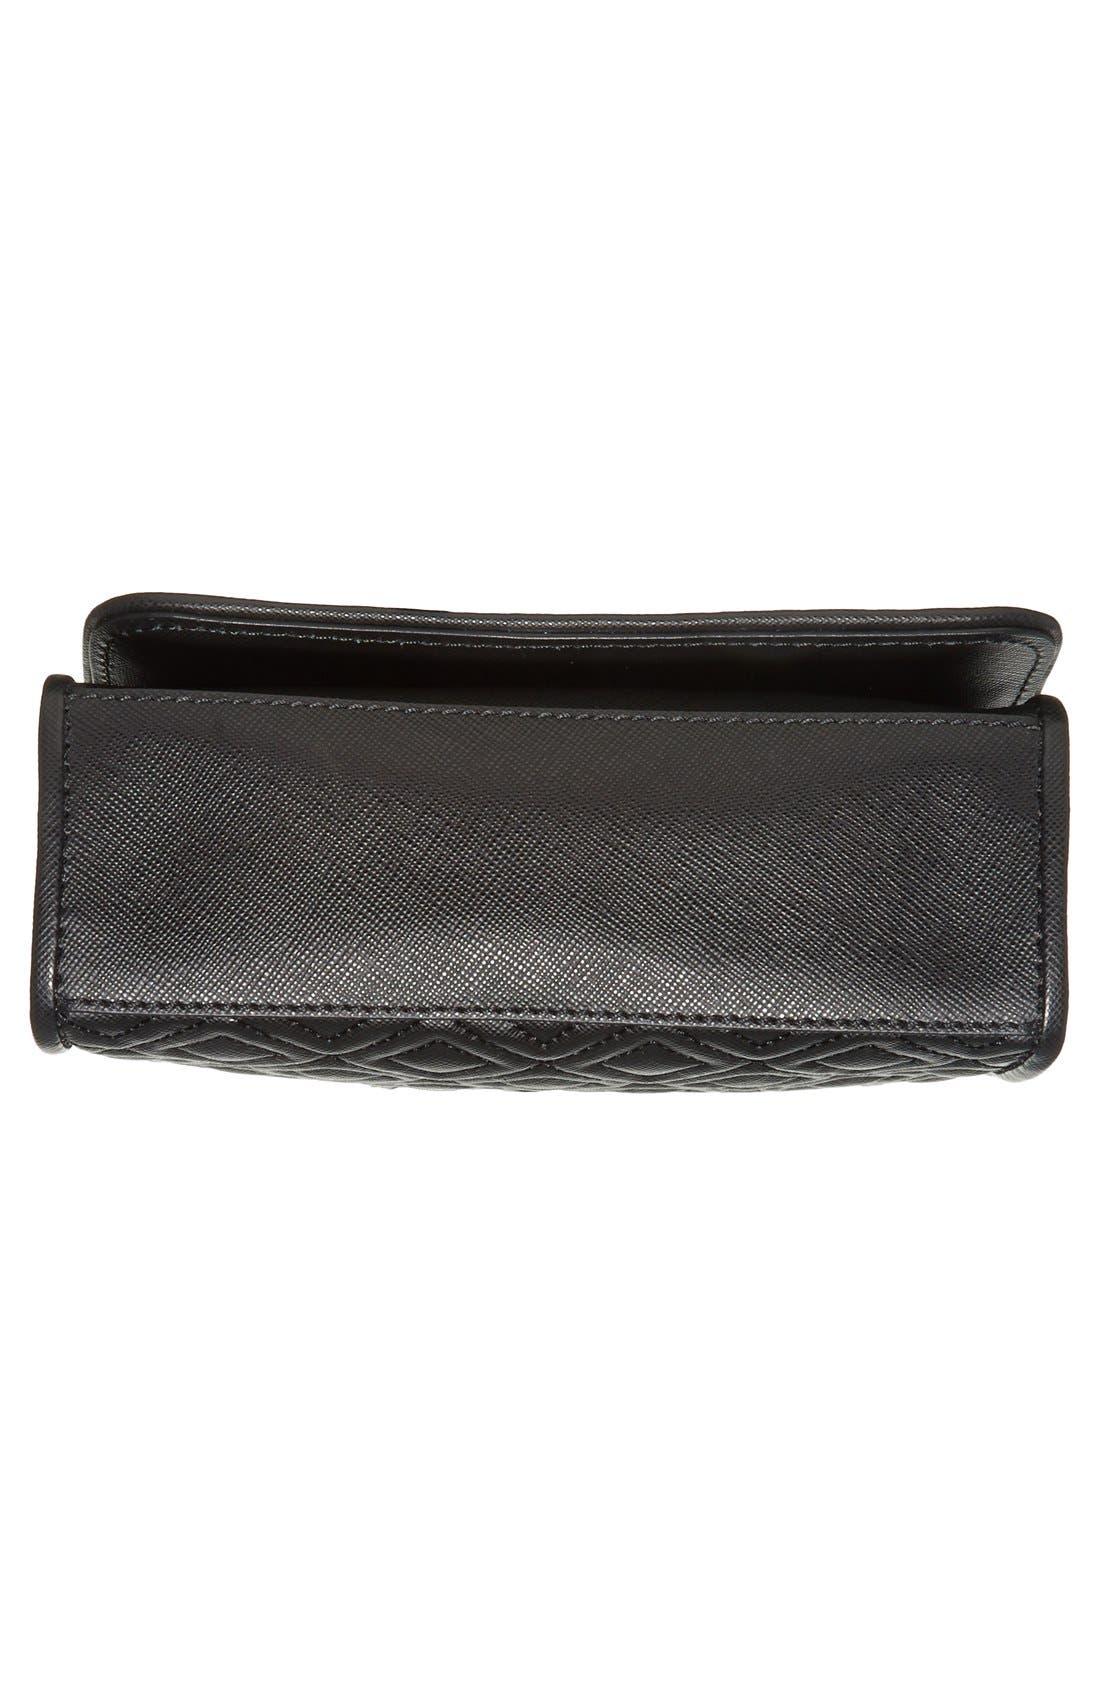 'Mini Fleming' Saffiano Leather Shoulder Bag,                             Alternate thumbnail 3, color,                             001